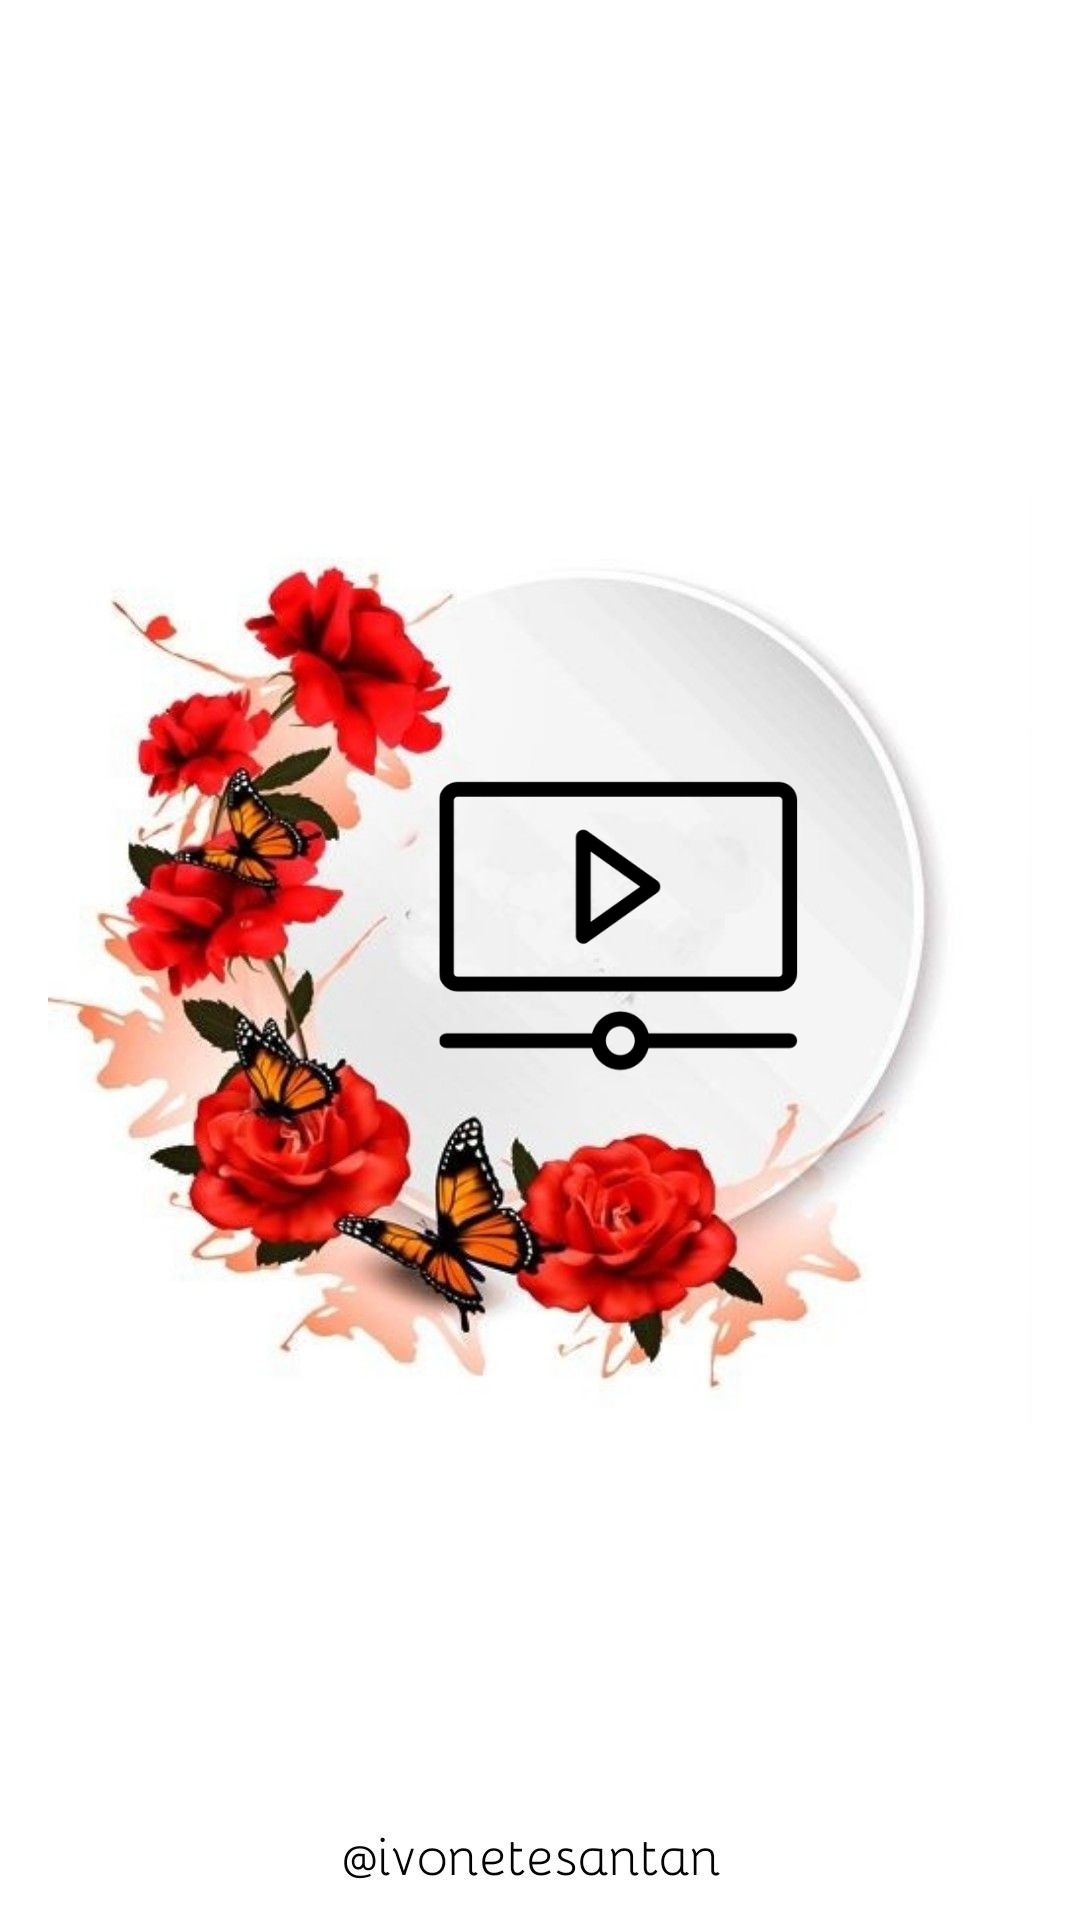 Pin de Th Queen em Instagram highlight icons Instagram